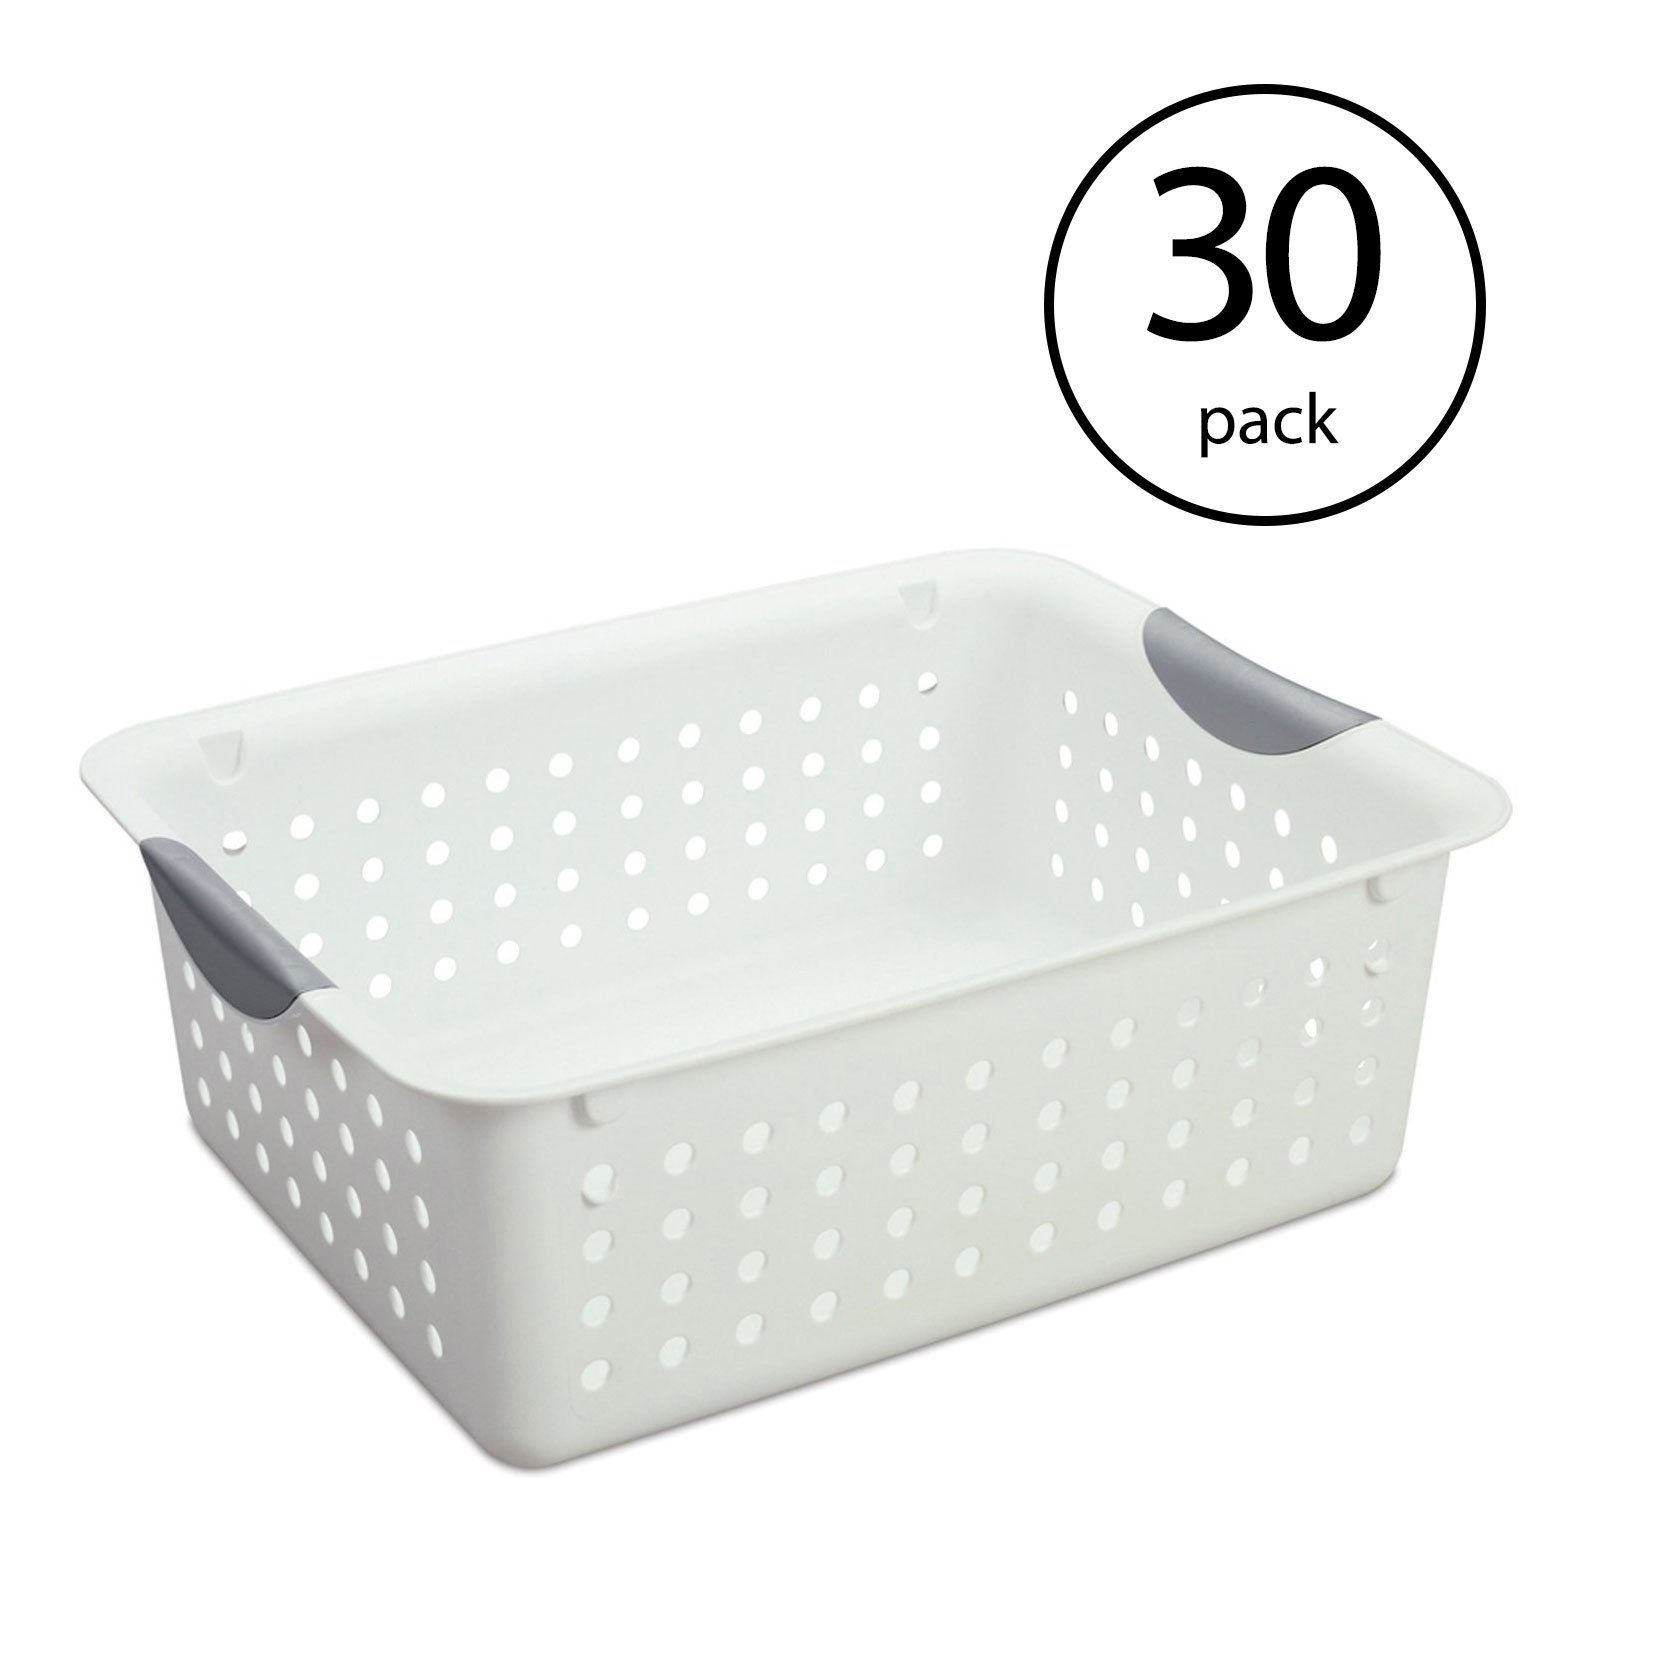 Sterilite 16248006 Medium Ultra Plastic Storage Organizer Basket White (30 Pack) - image 6 de 6